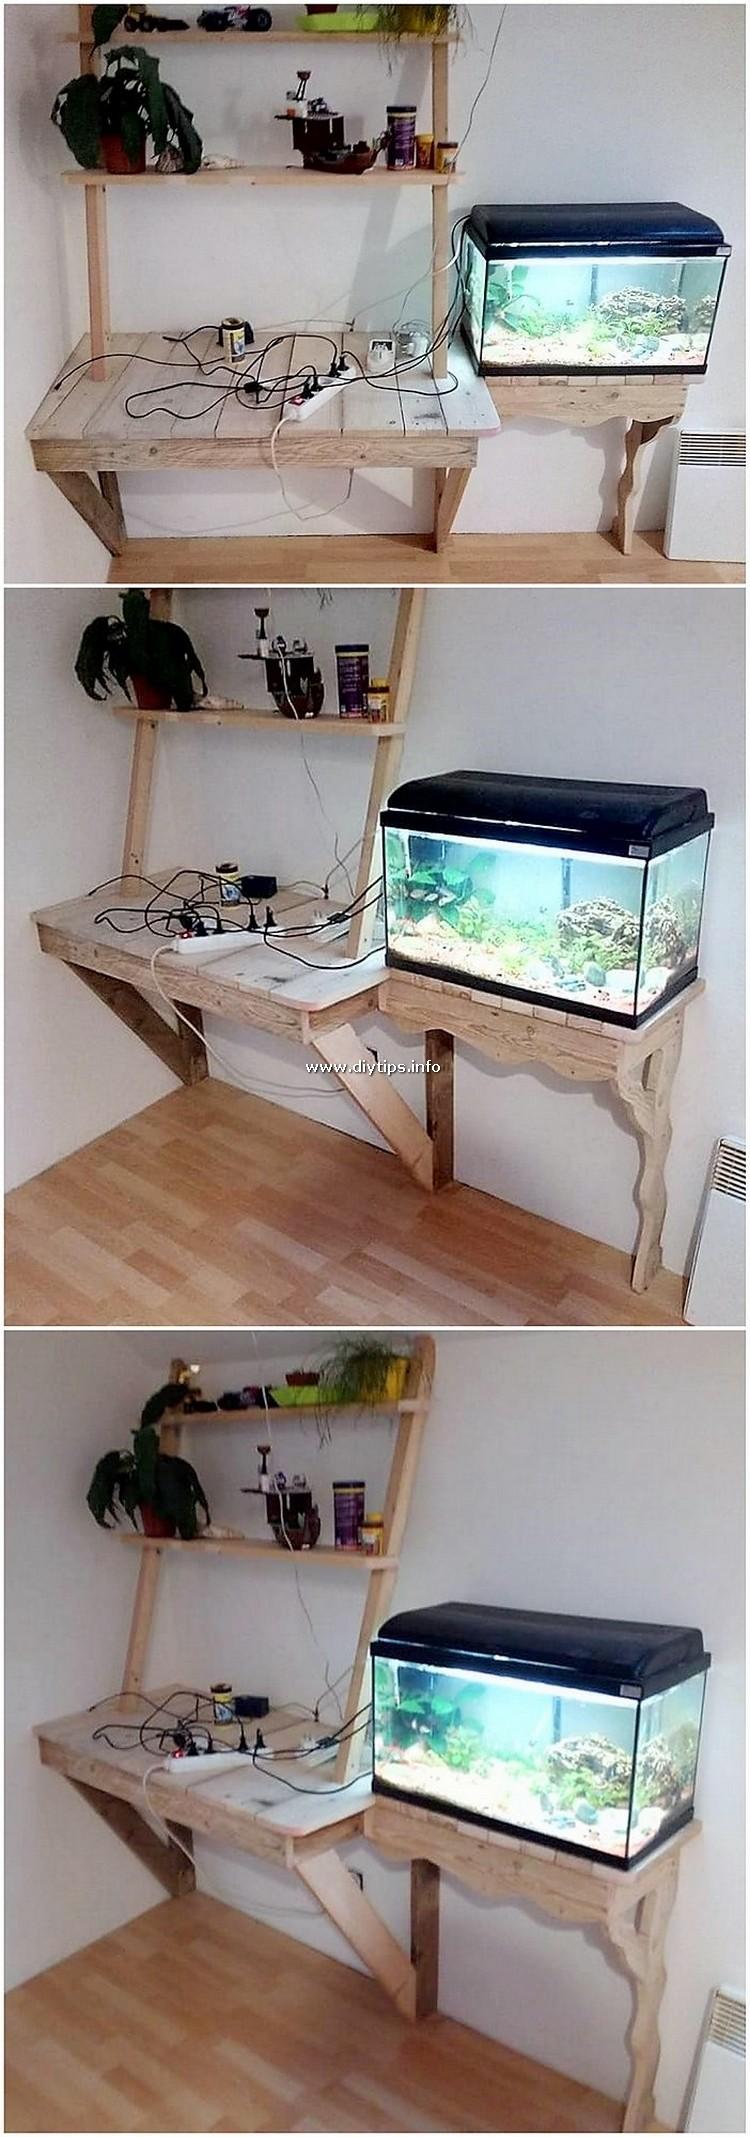 Pallet Desk Table and Aquarium Stand